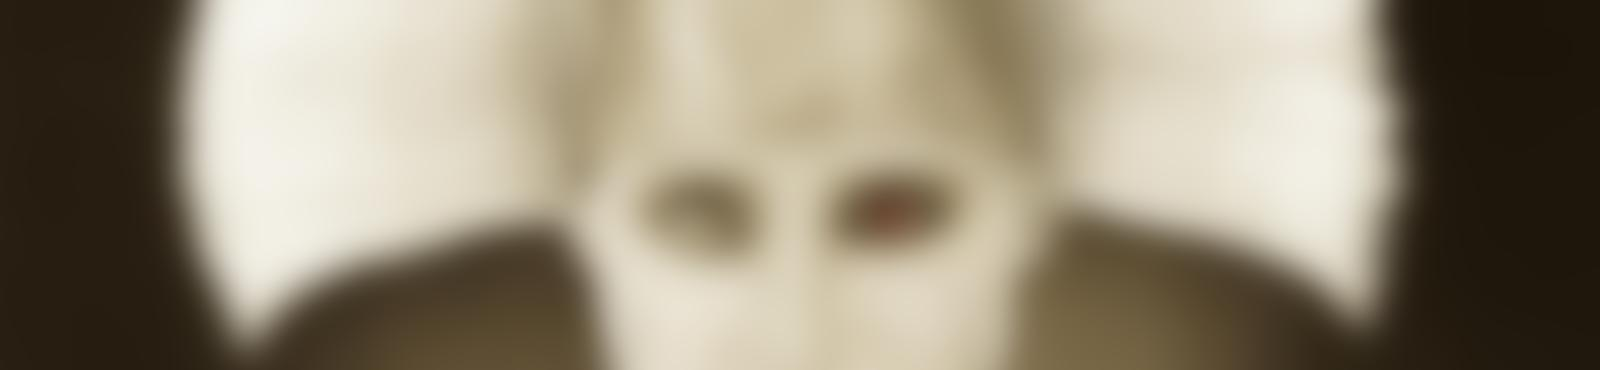 Blurred 127d6384 51b9 4048 abc4 c3a98c602827